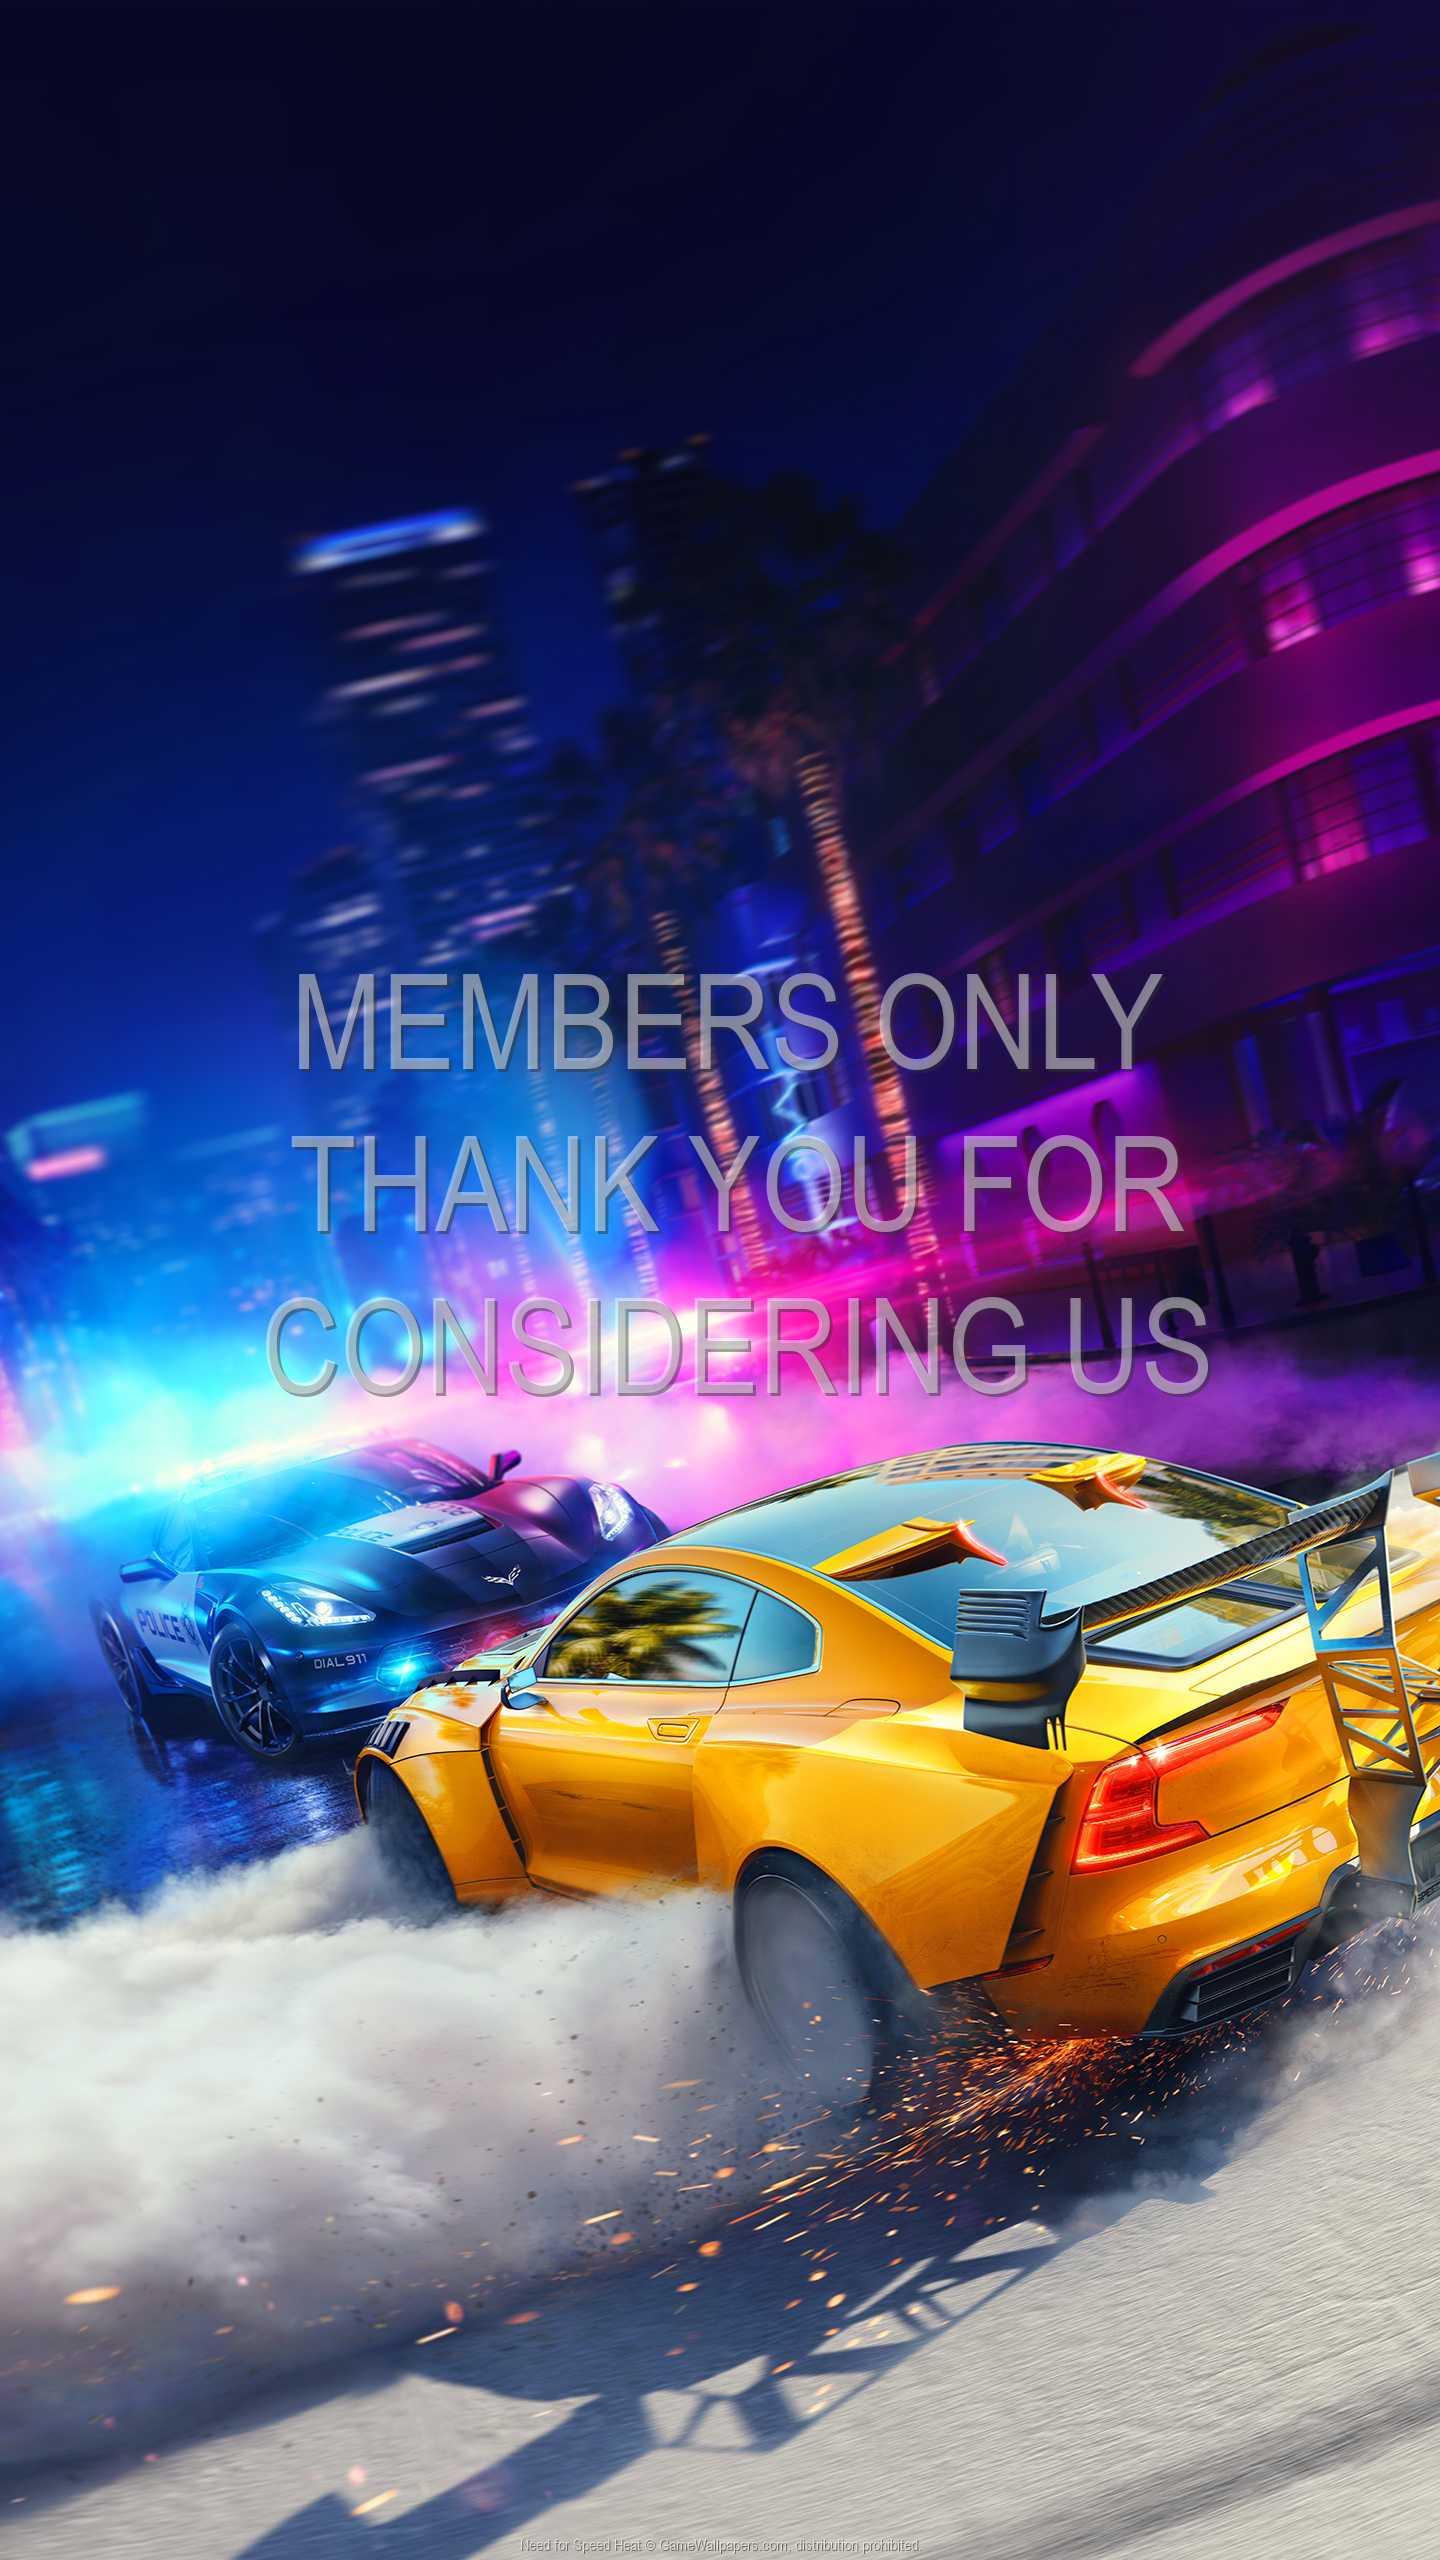 Need for Speed: Heat 1440p Vertical Handy Hintergrundbild 01